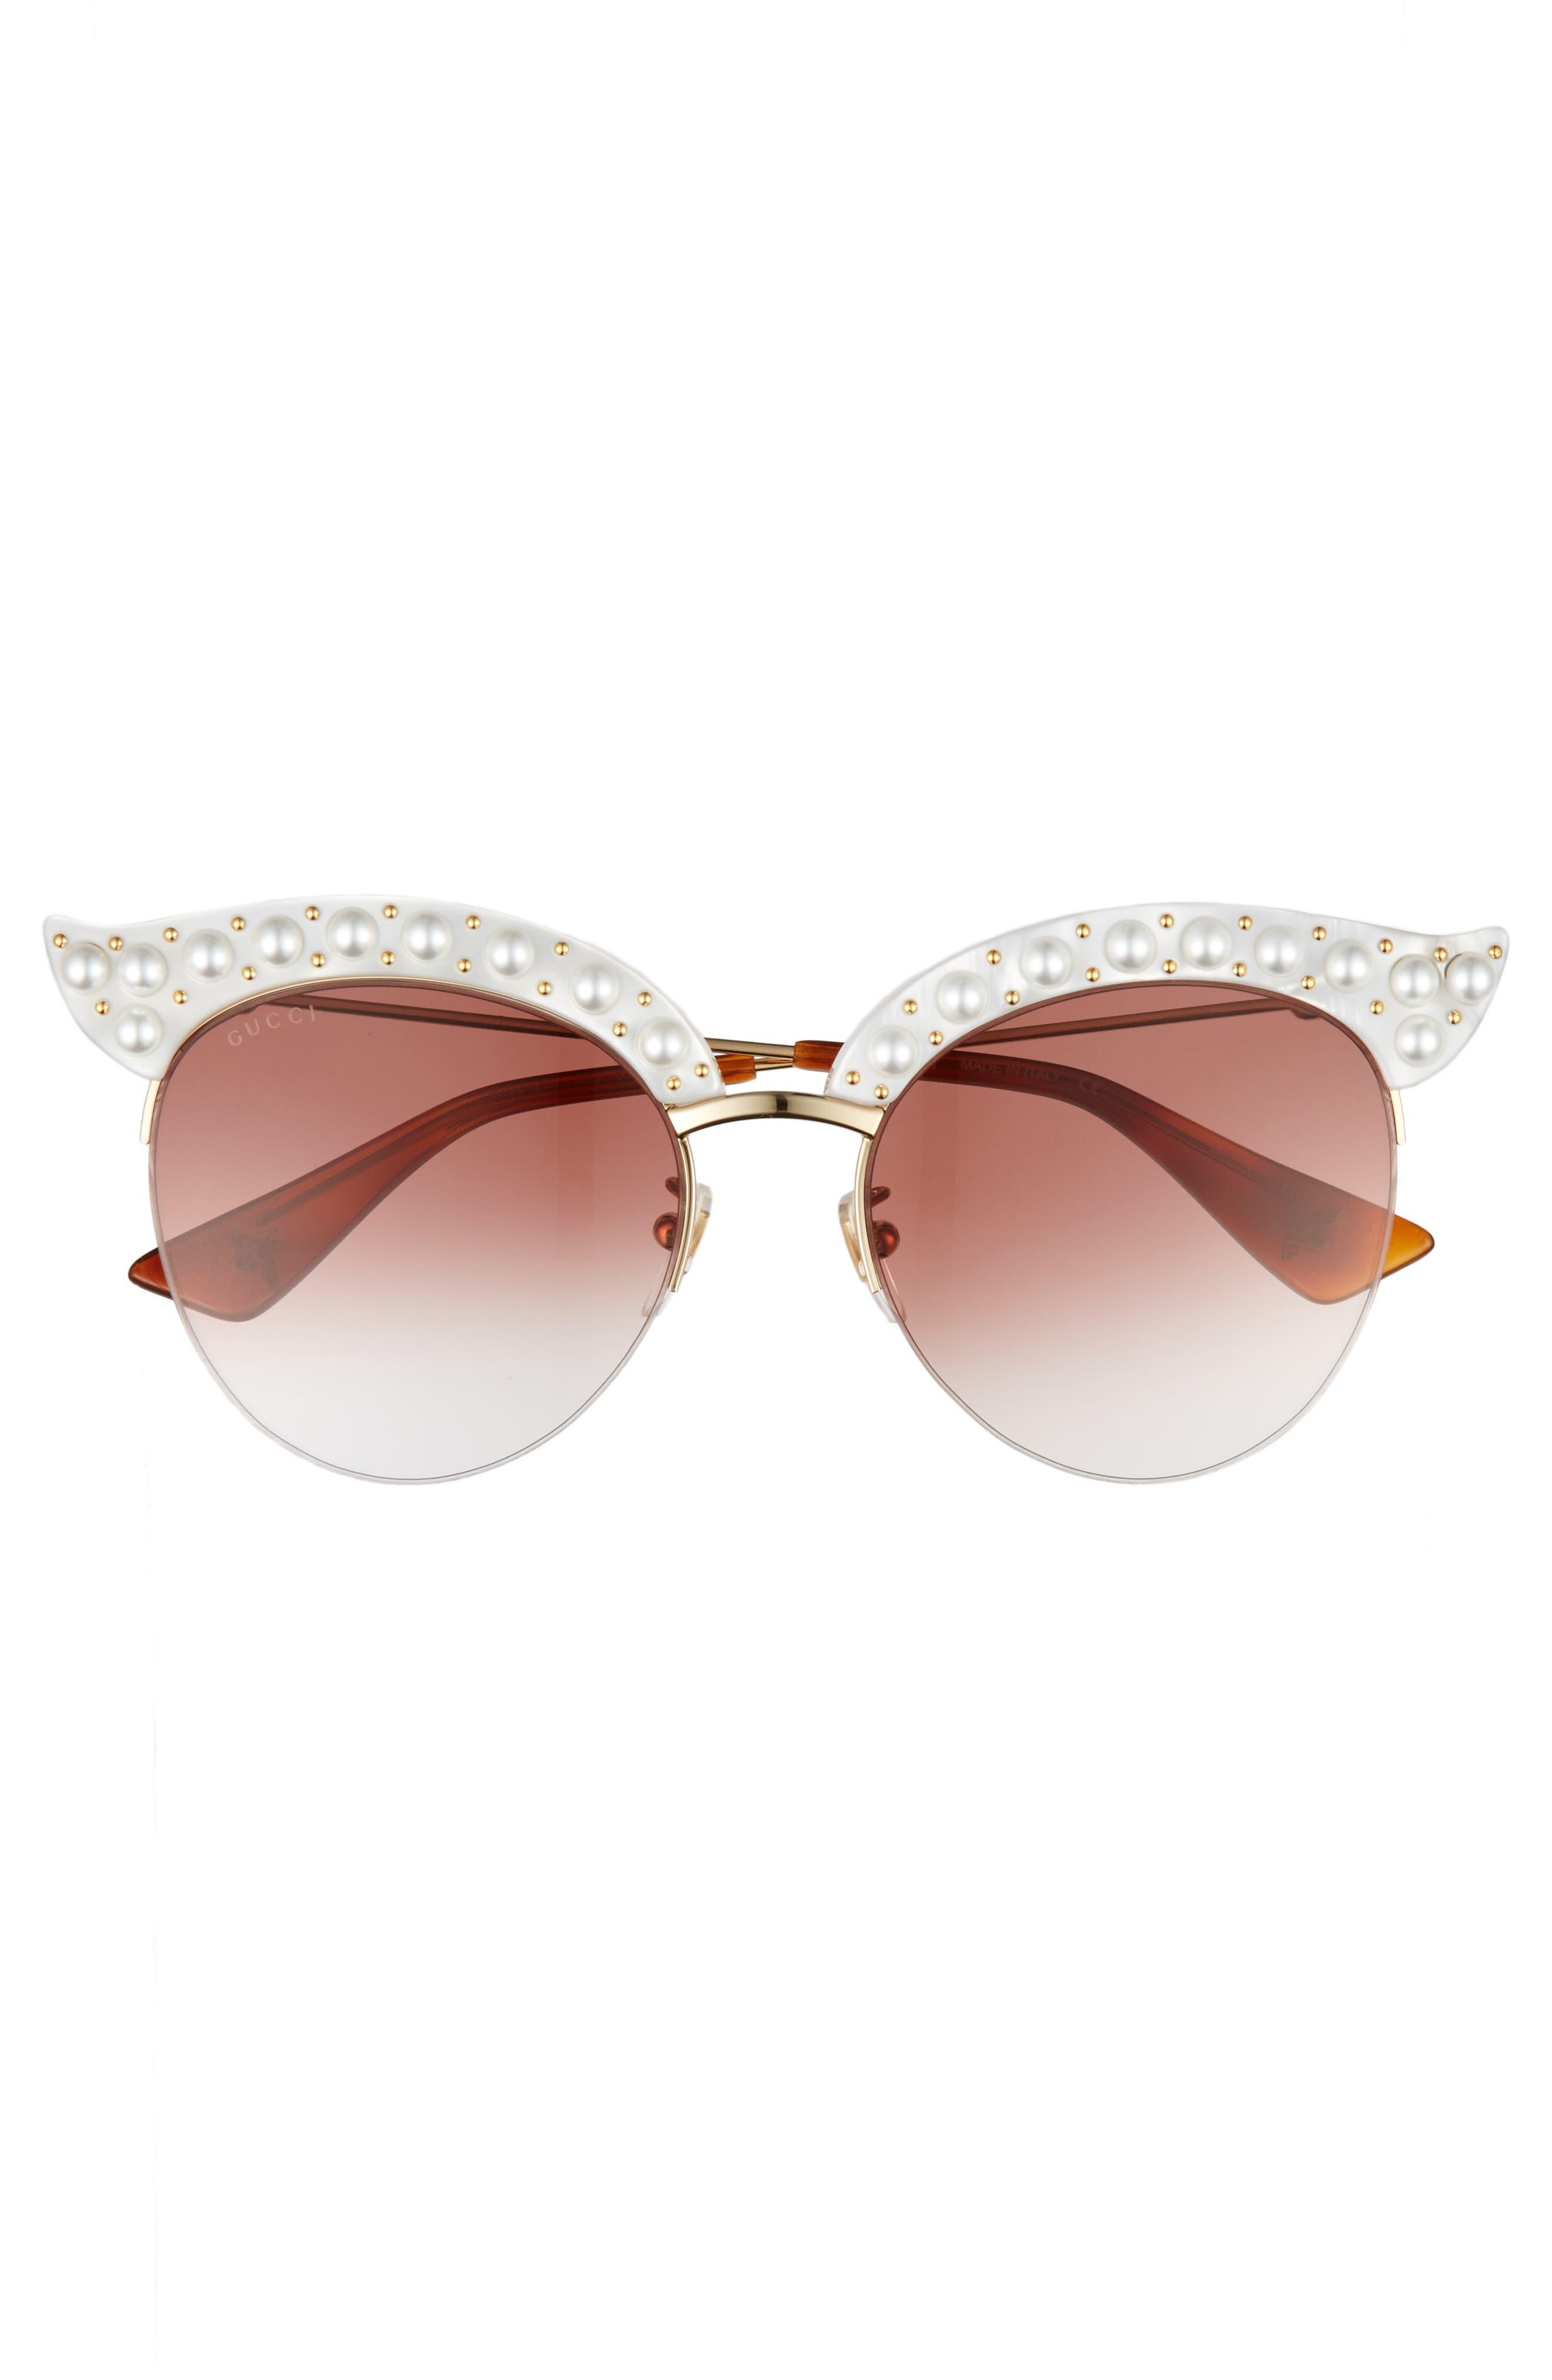 53mm Embellished Cat Eye Sunglasses,                             Alternate thumbnail 3, color,                             White